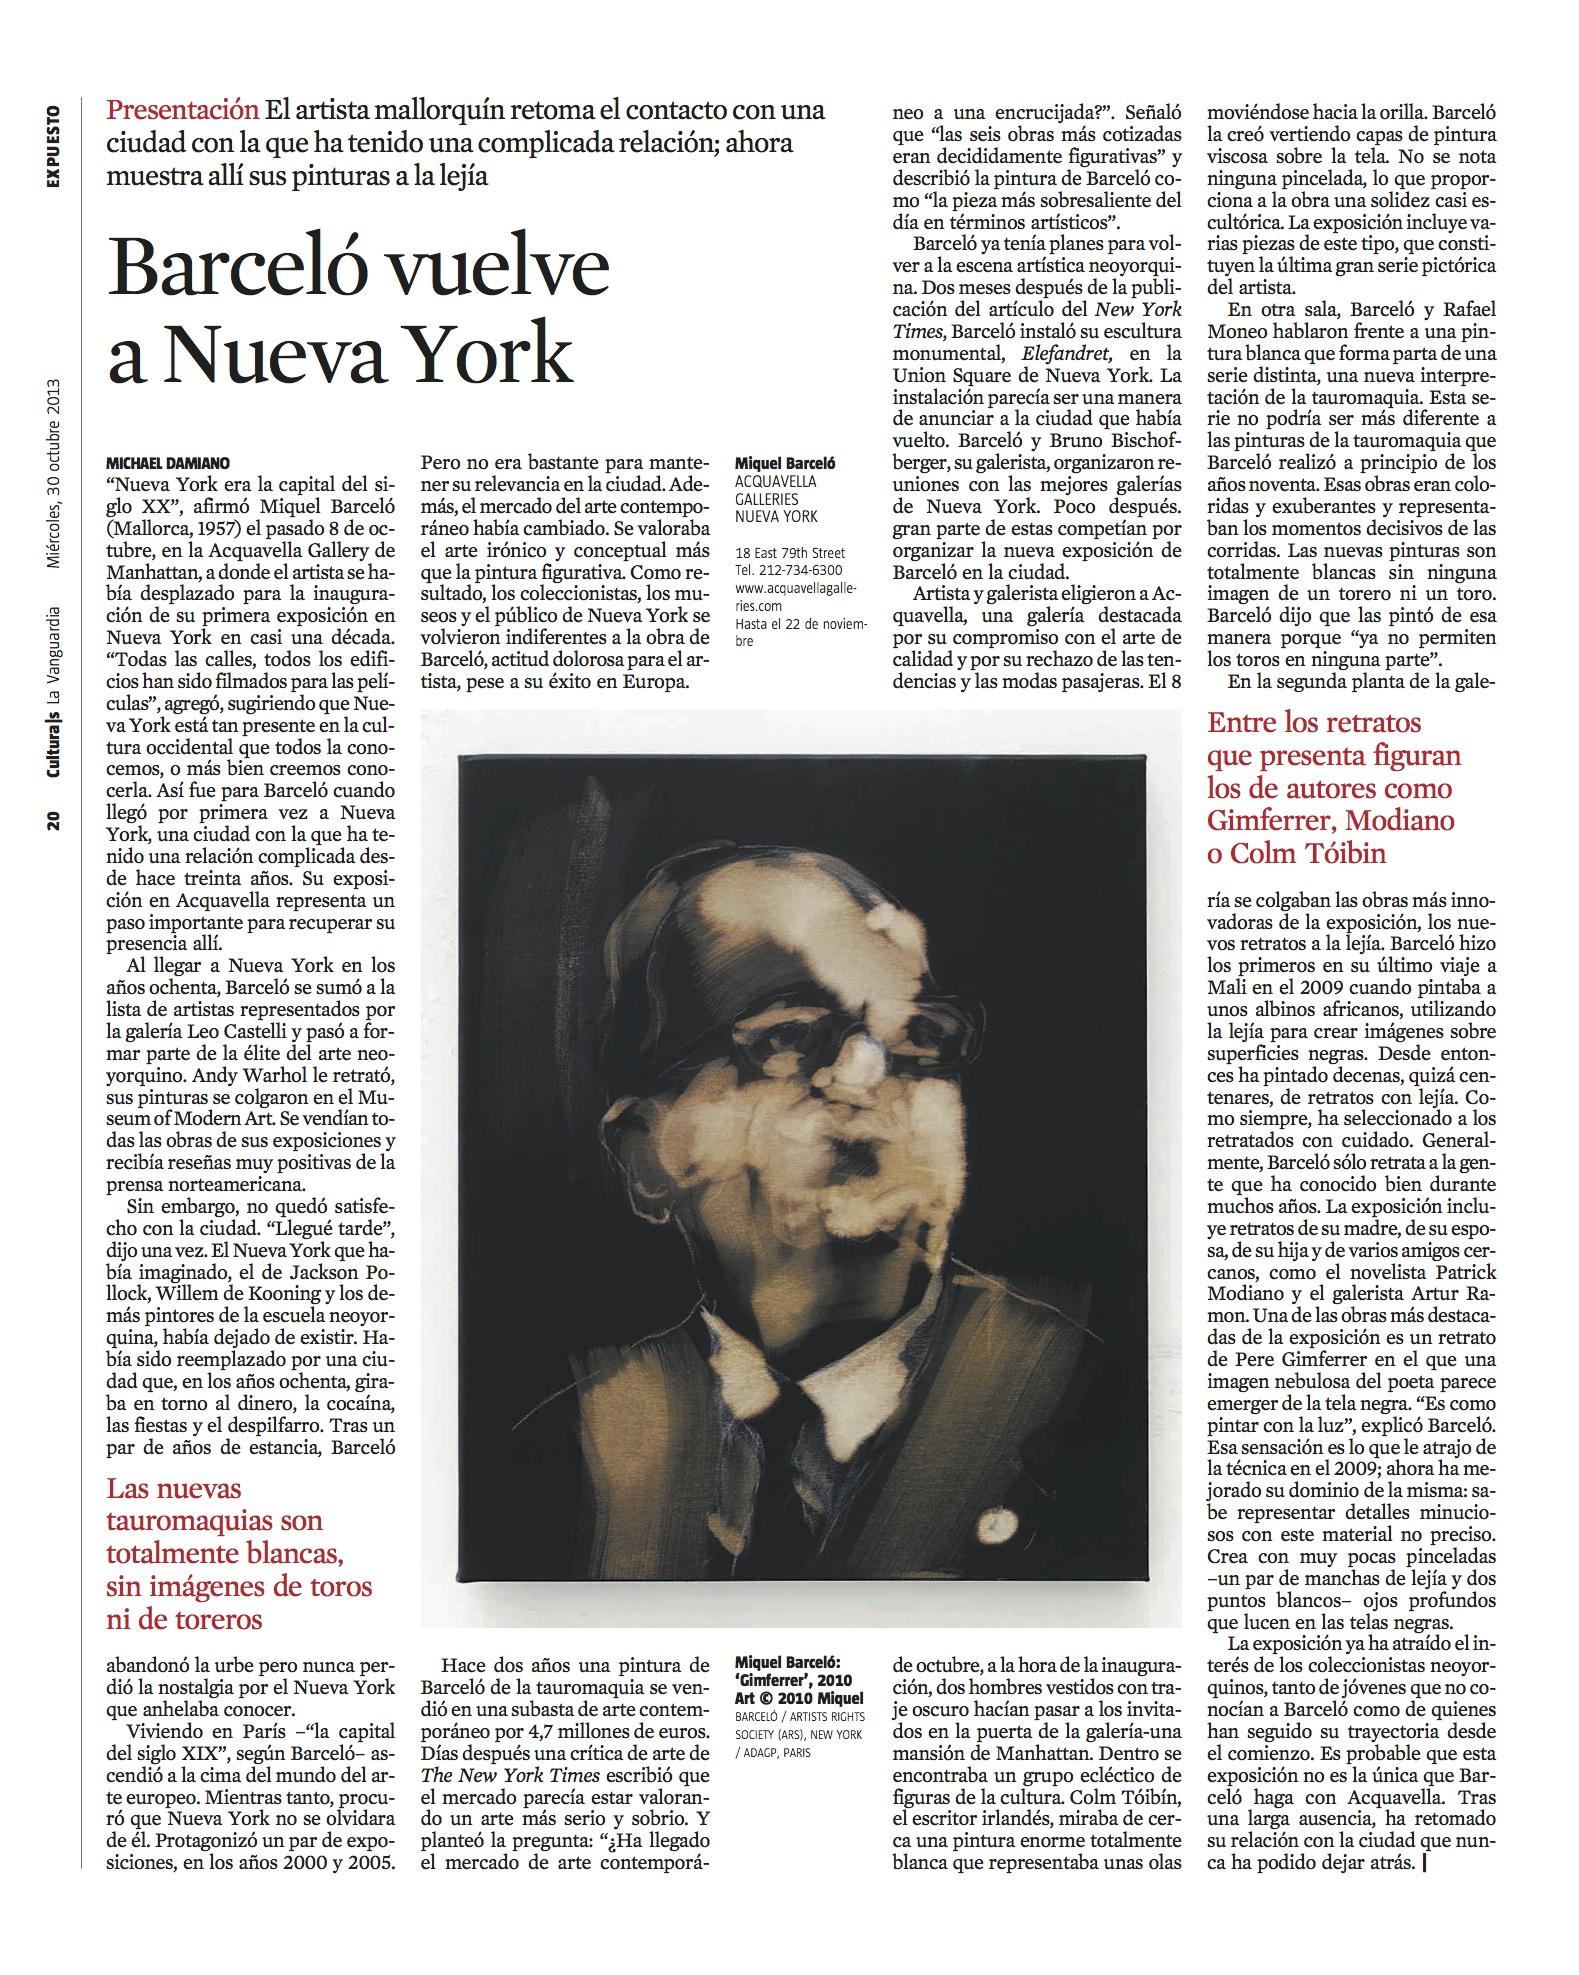 Barceló vuelve a Nueva York (La Vanguardia)